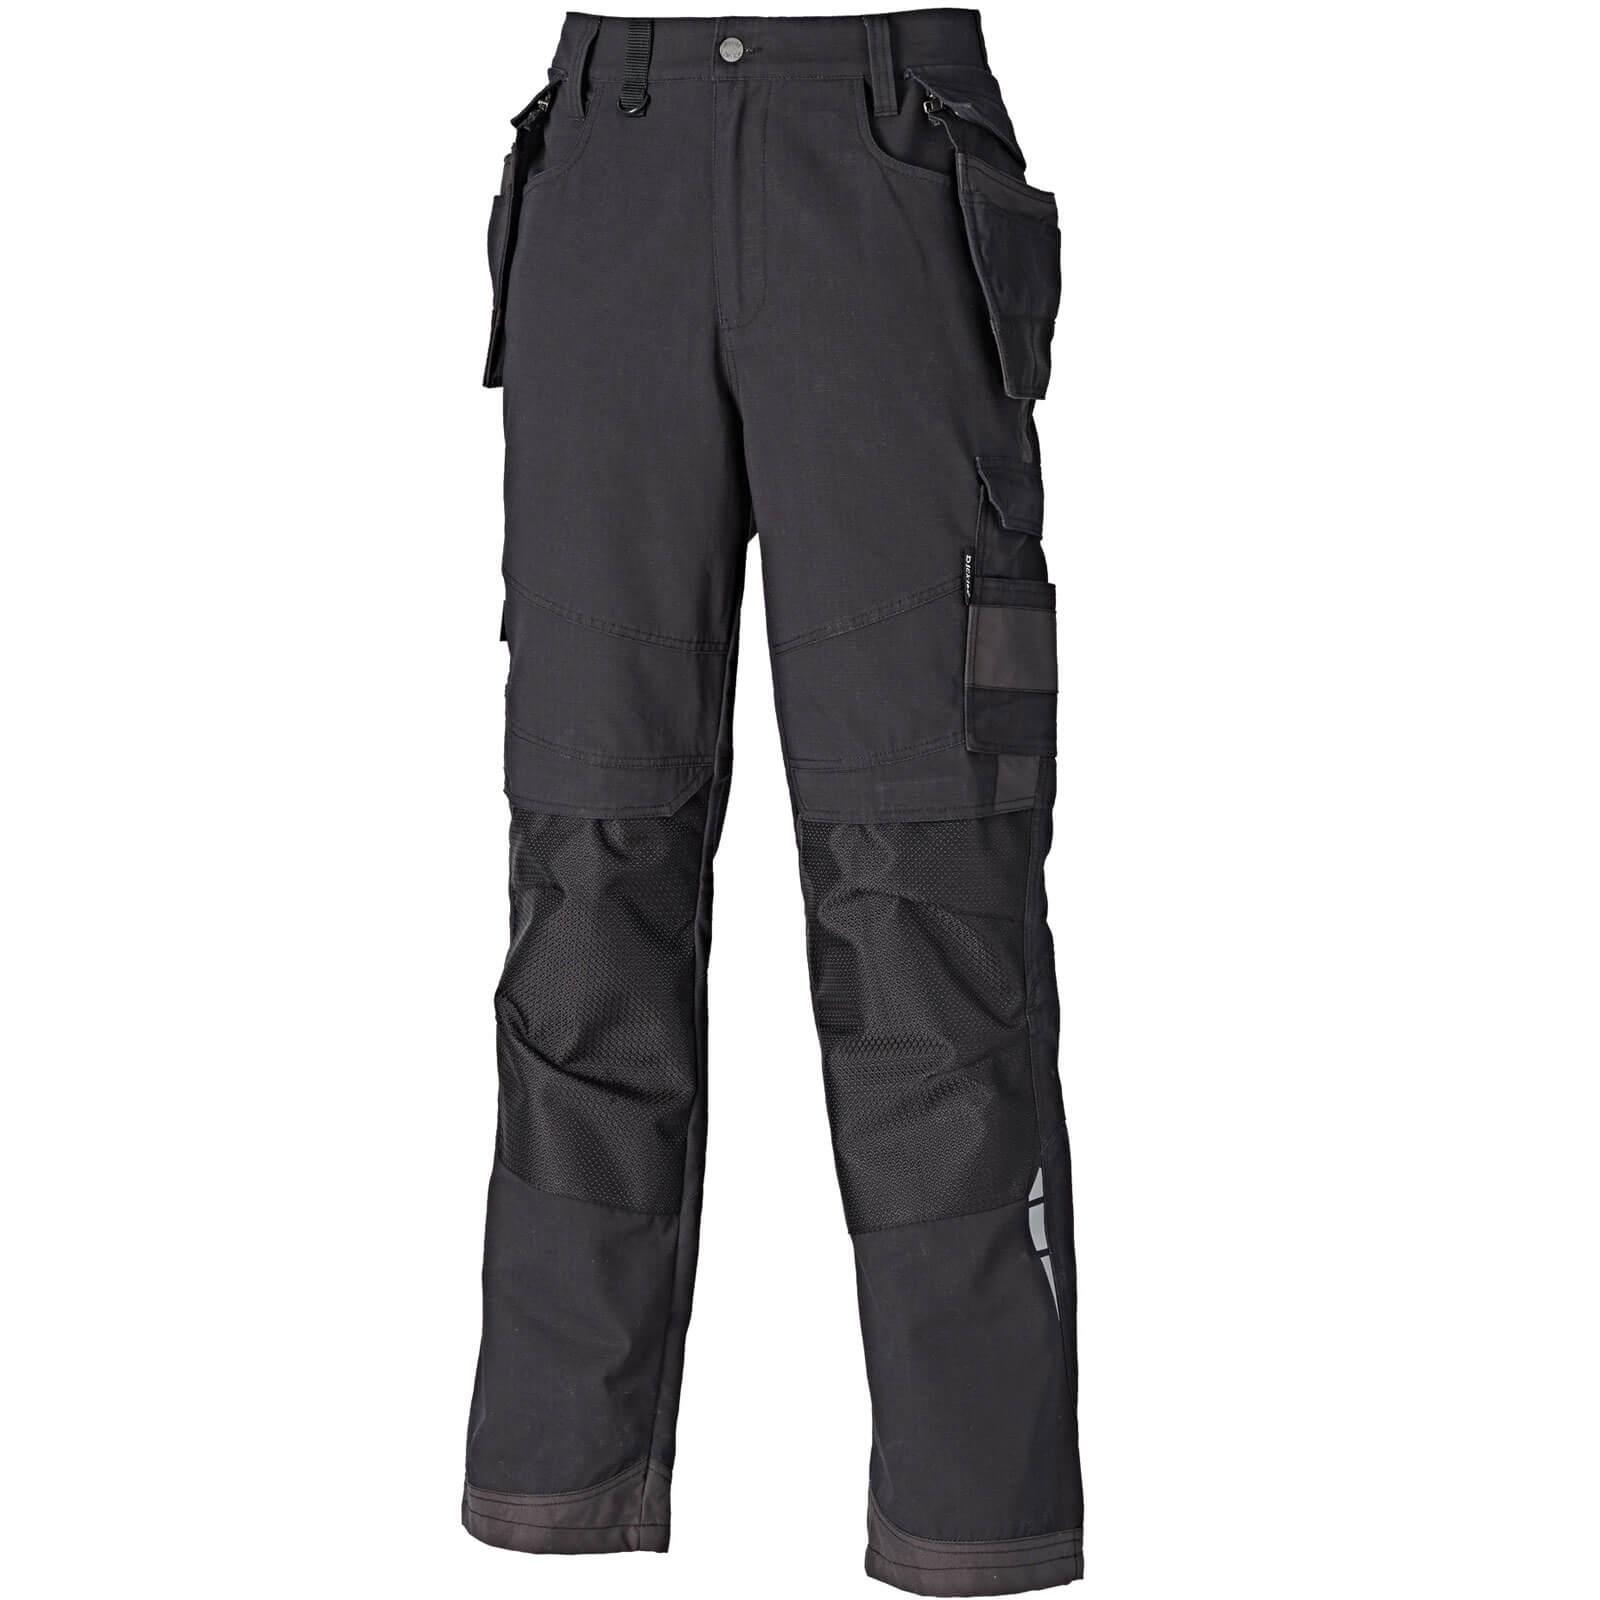 Photo of Dickies mens eisenhower premium trousers black 36